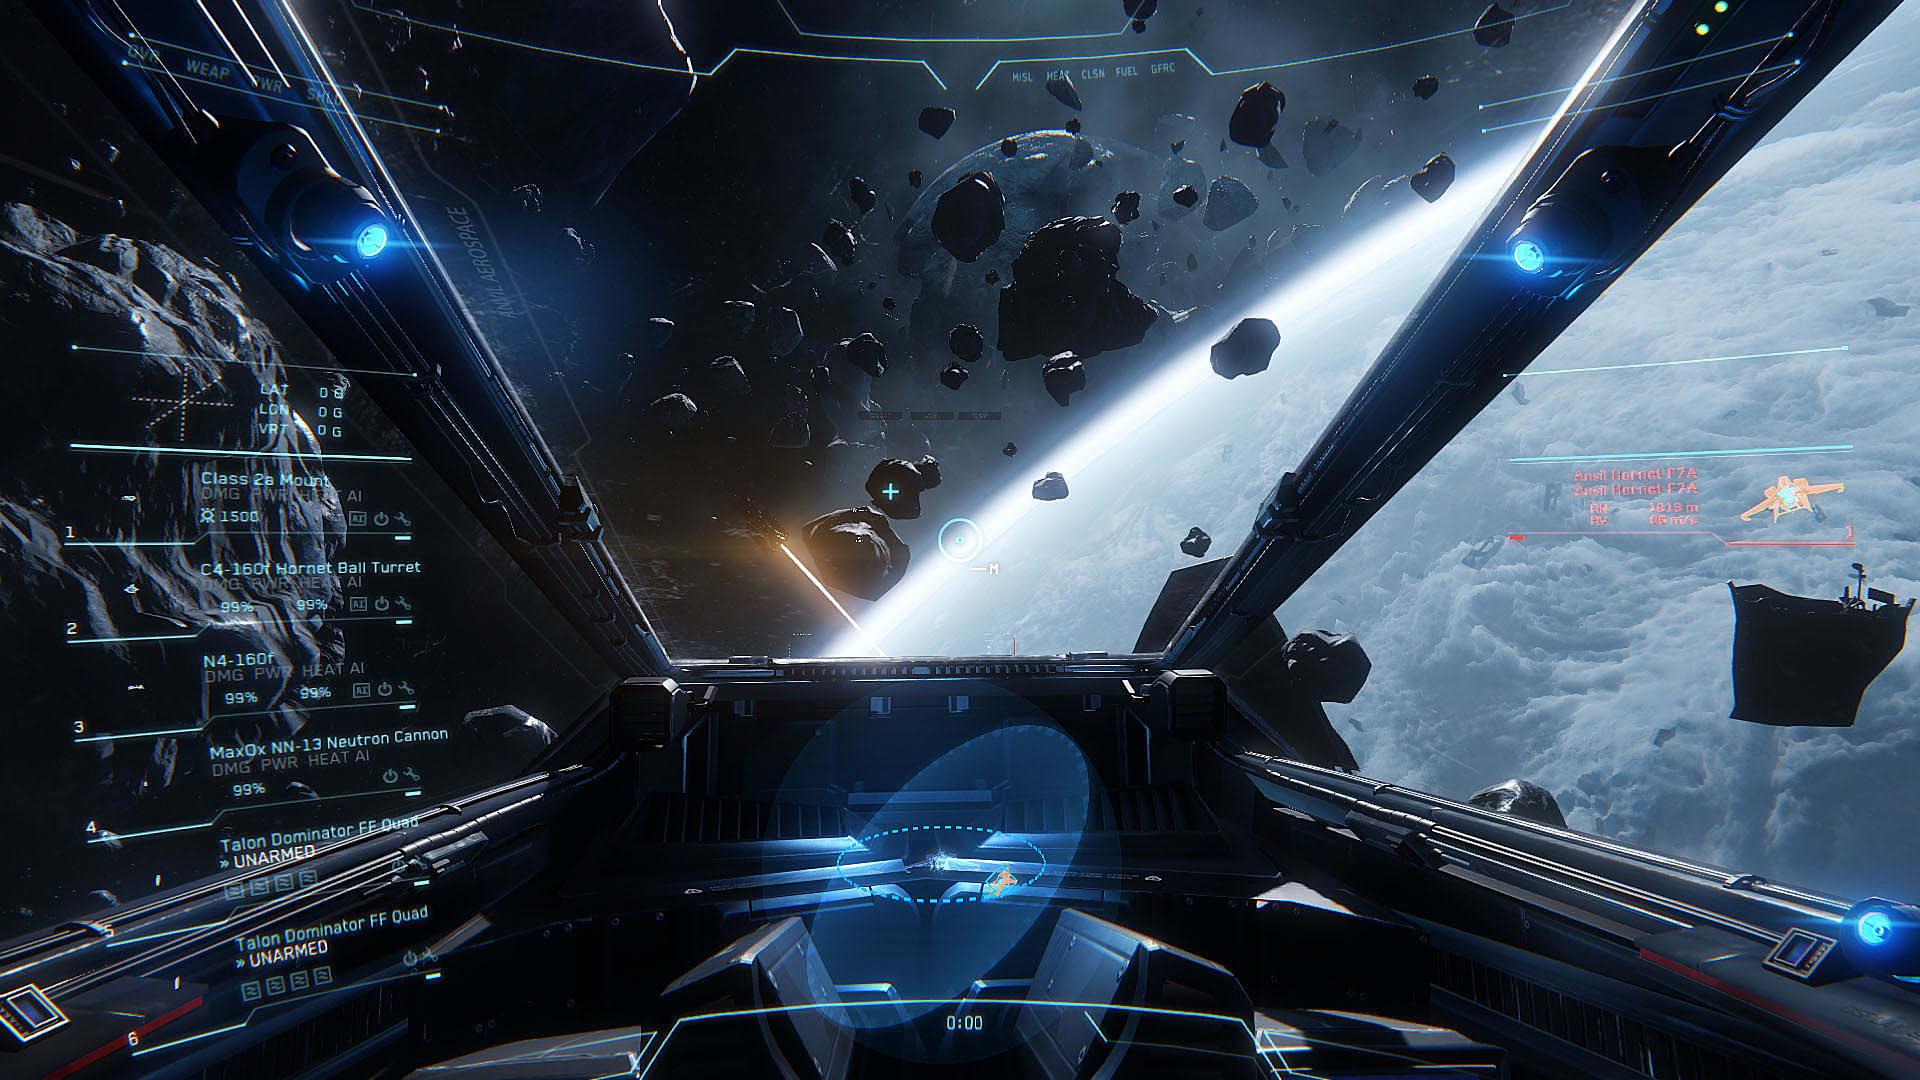 Space Truckin': 6 Space Sim Games You Must Play Before You Die